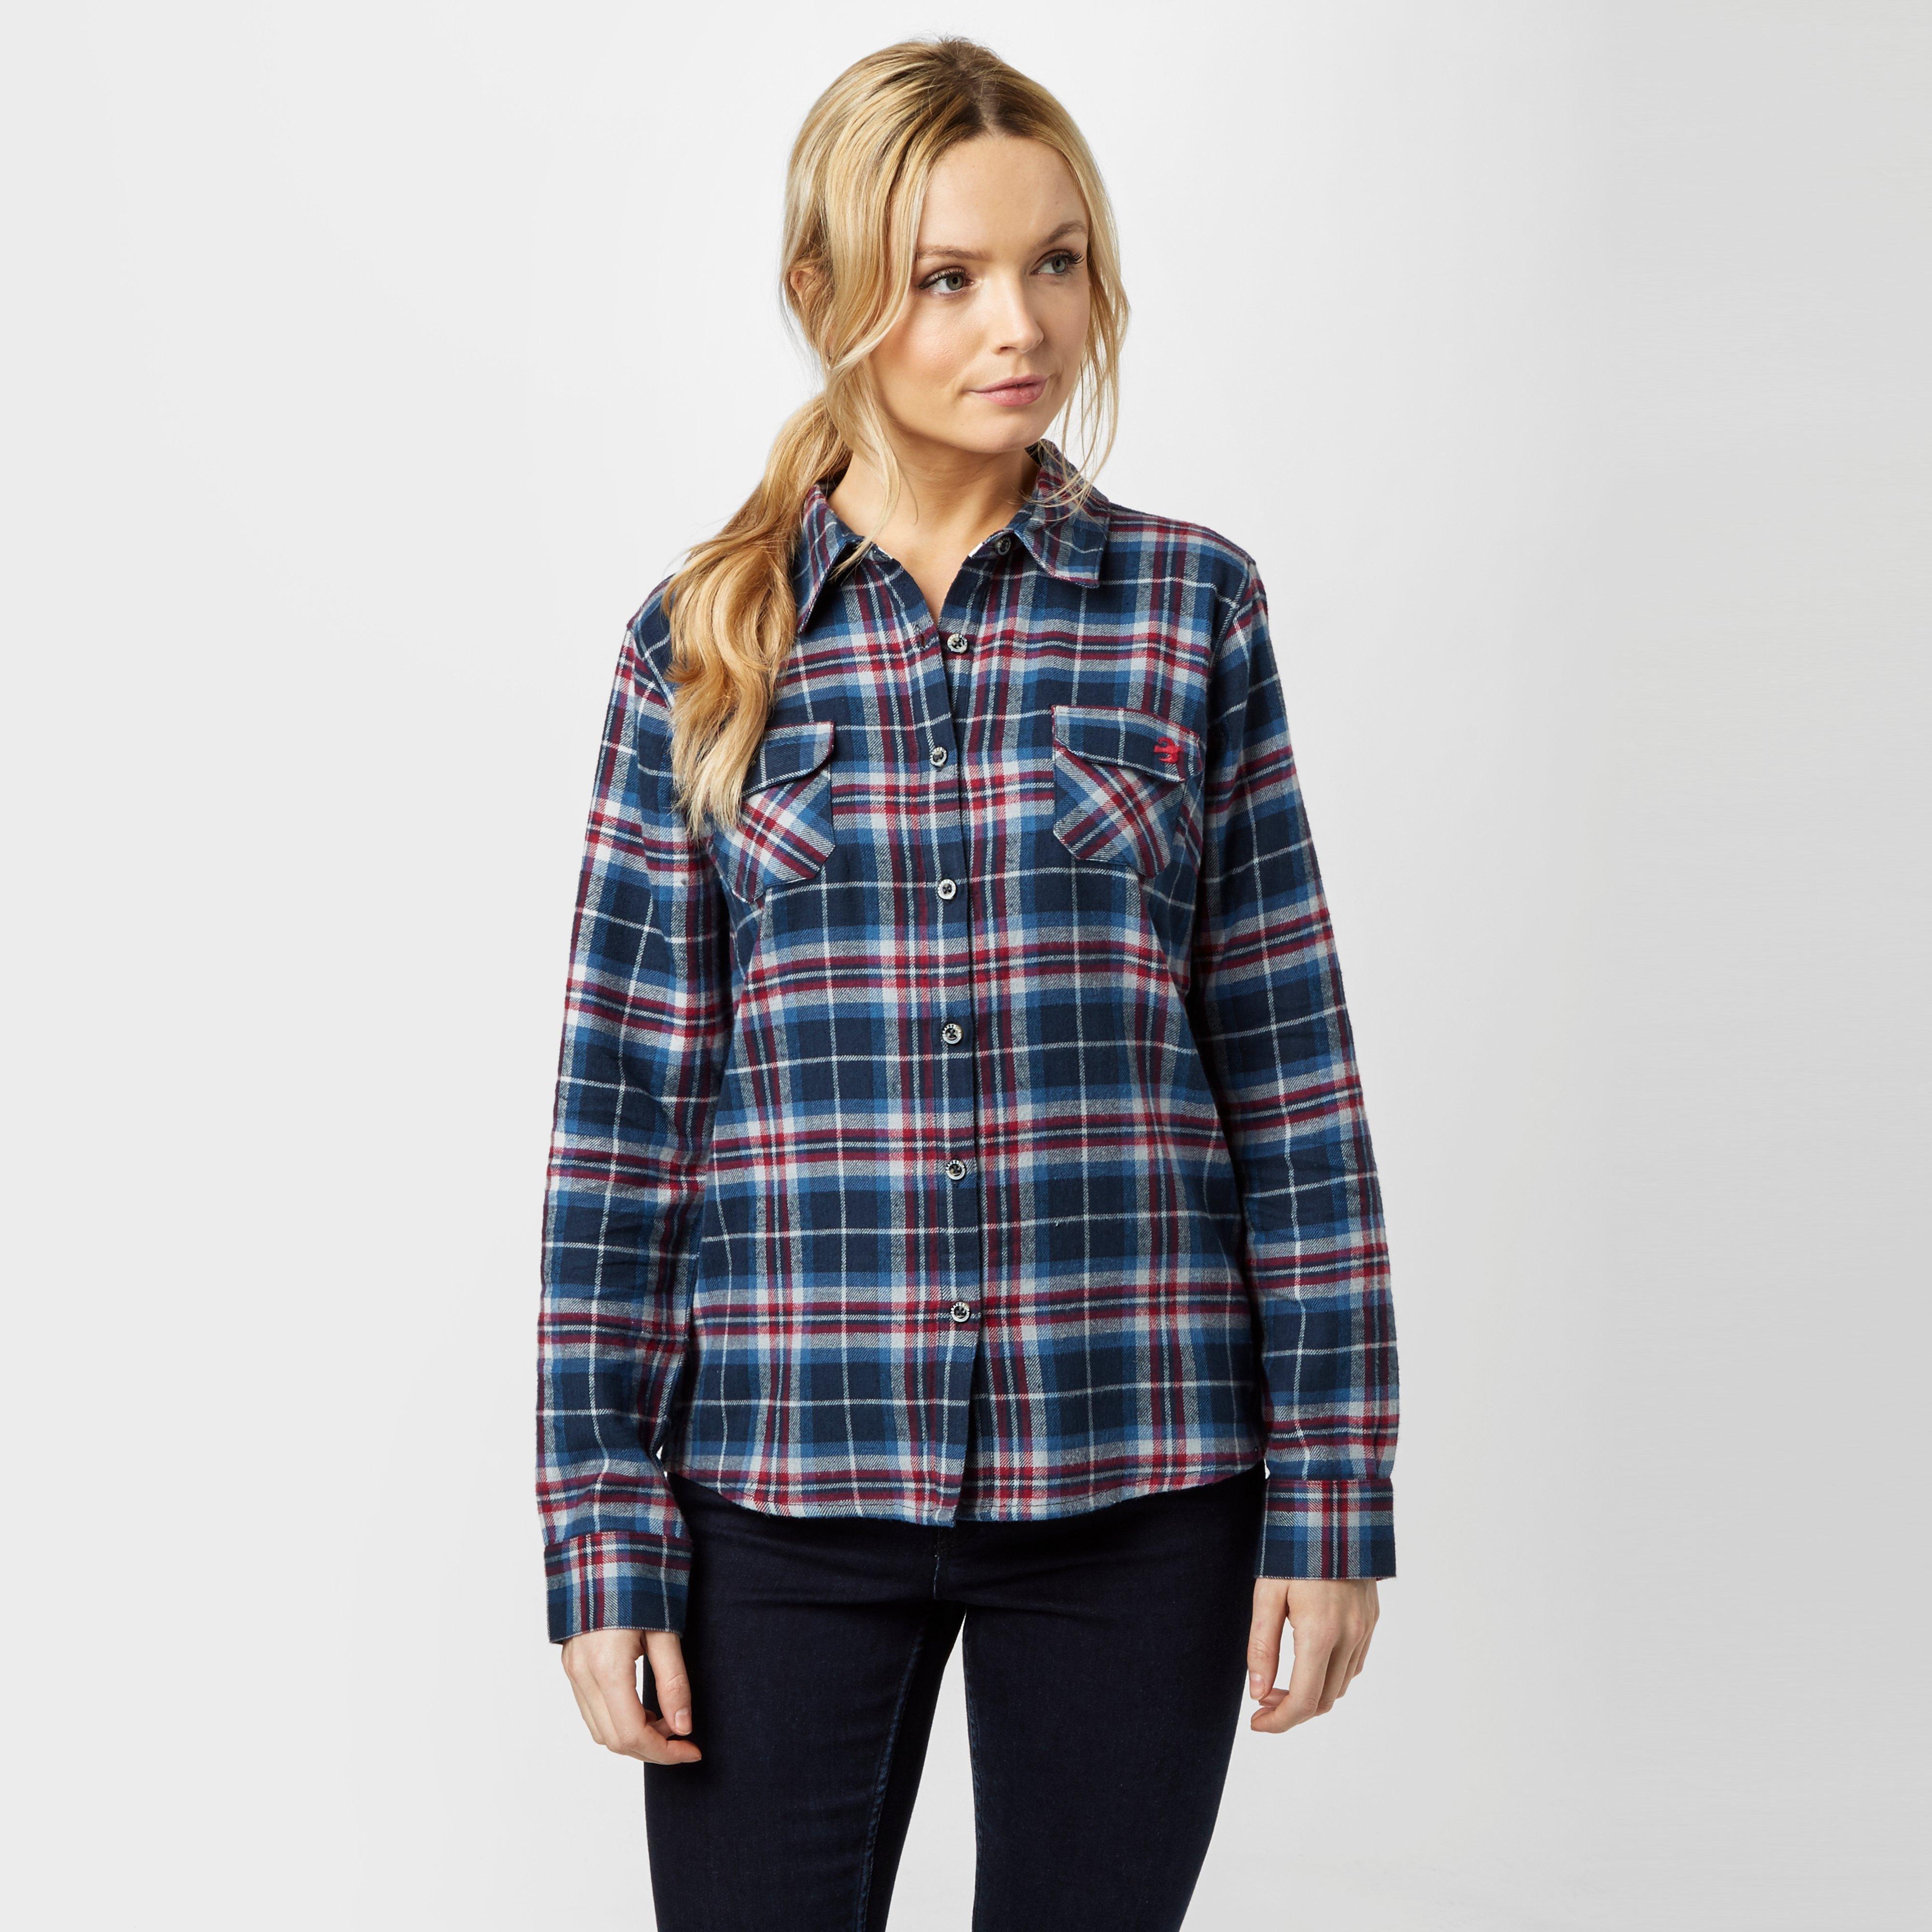 Brakeburn Brakeburn Womens Check Flannel Shirt - Navy, Navy